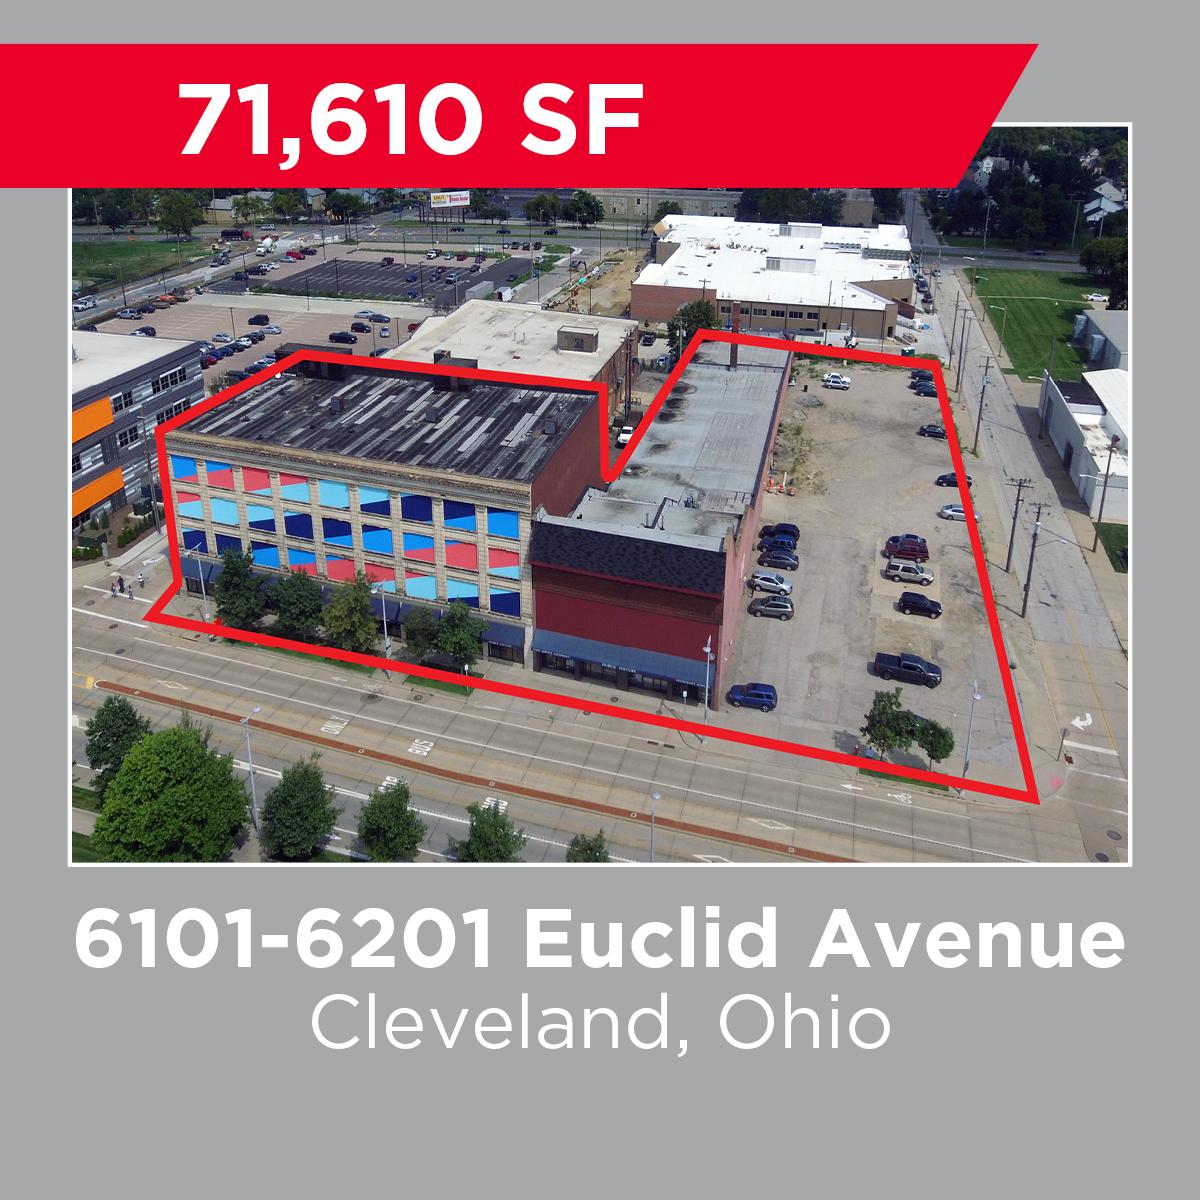 6101-6201 Euclid Avenue.jpg